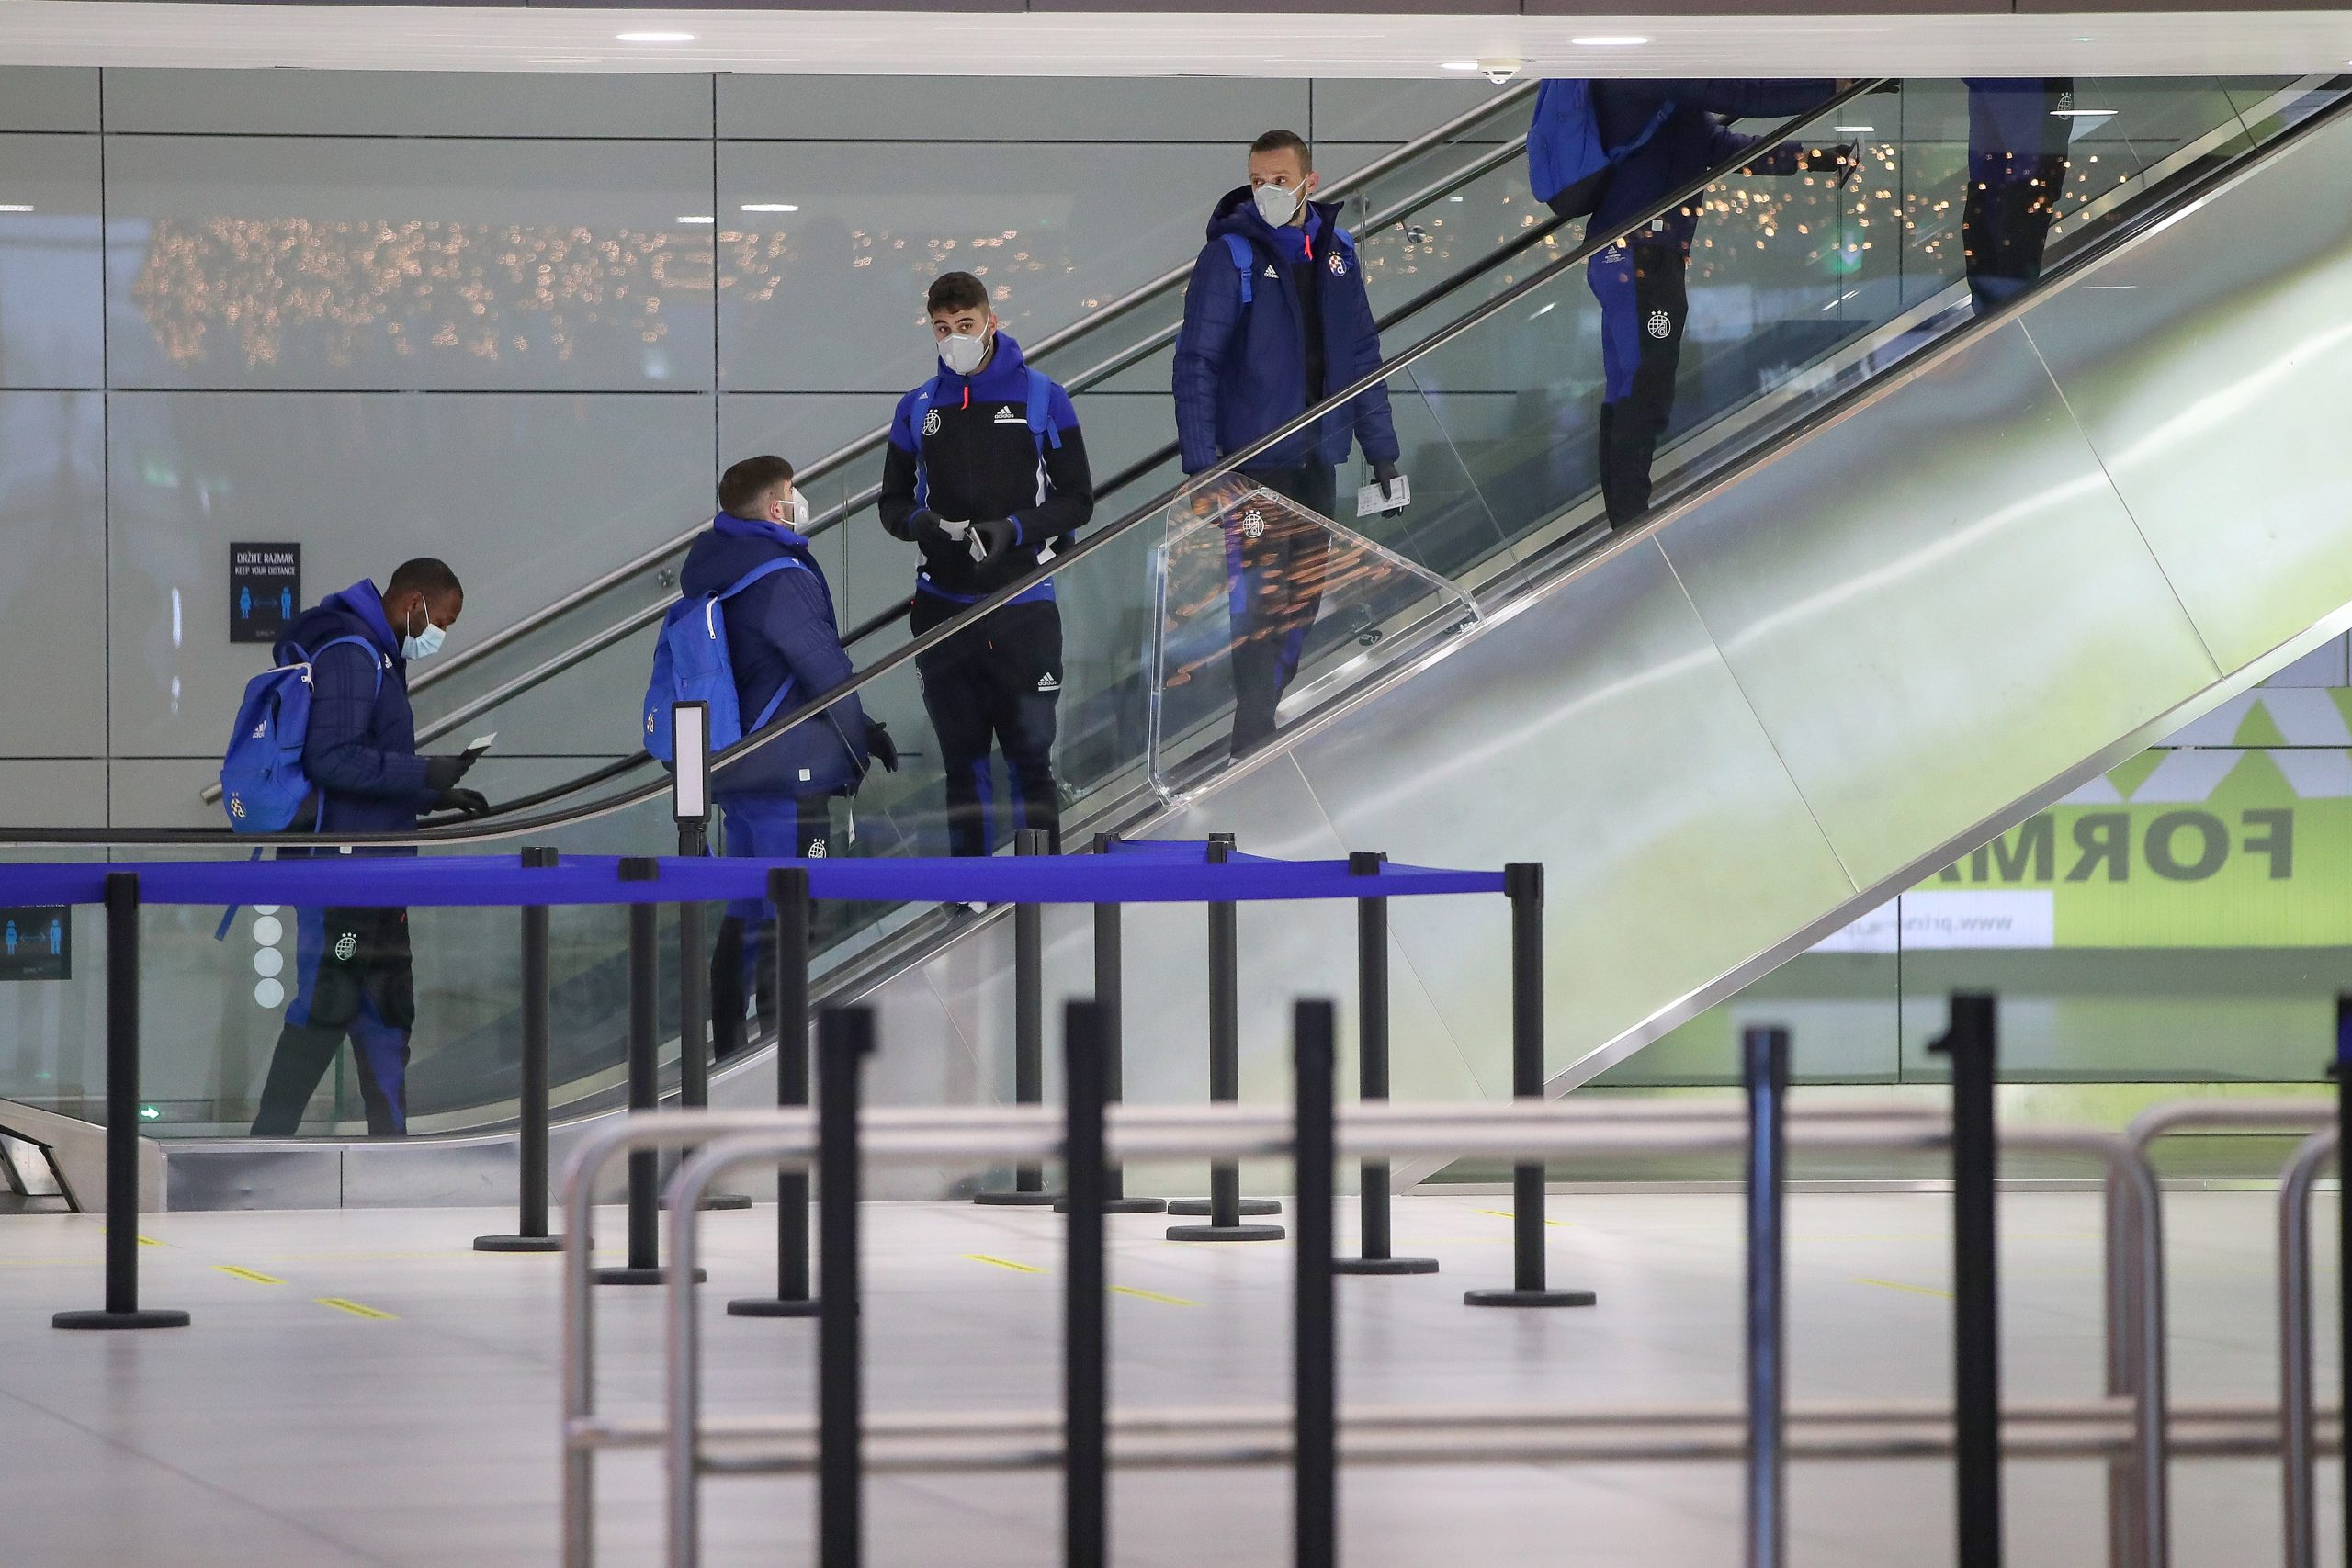 Modri u Zračnoj luci Franjo Tuđman/Foto PIXSELL